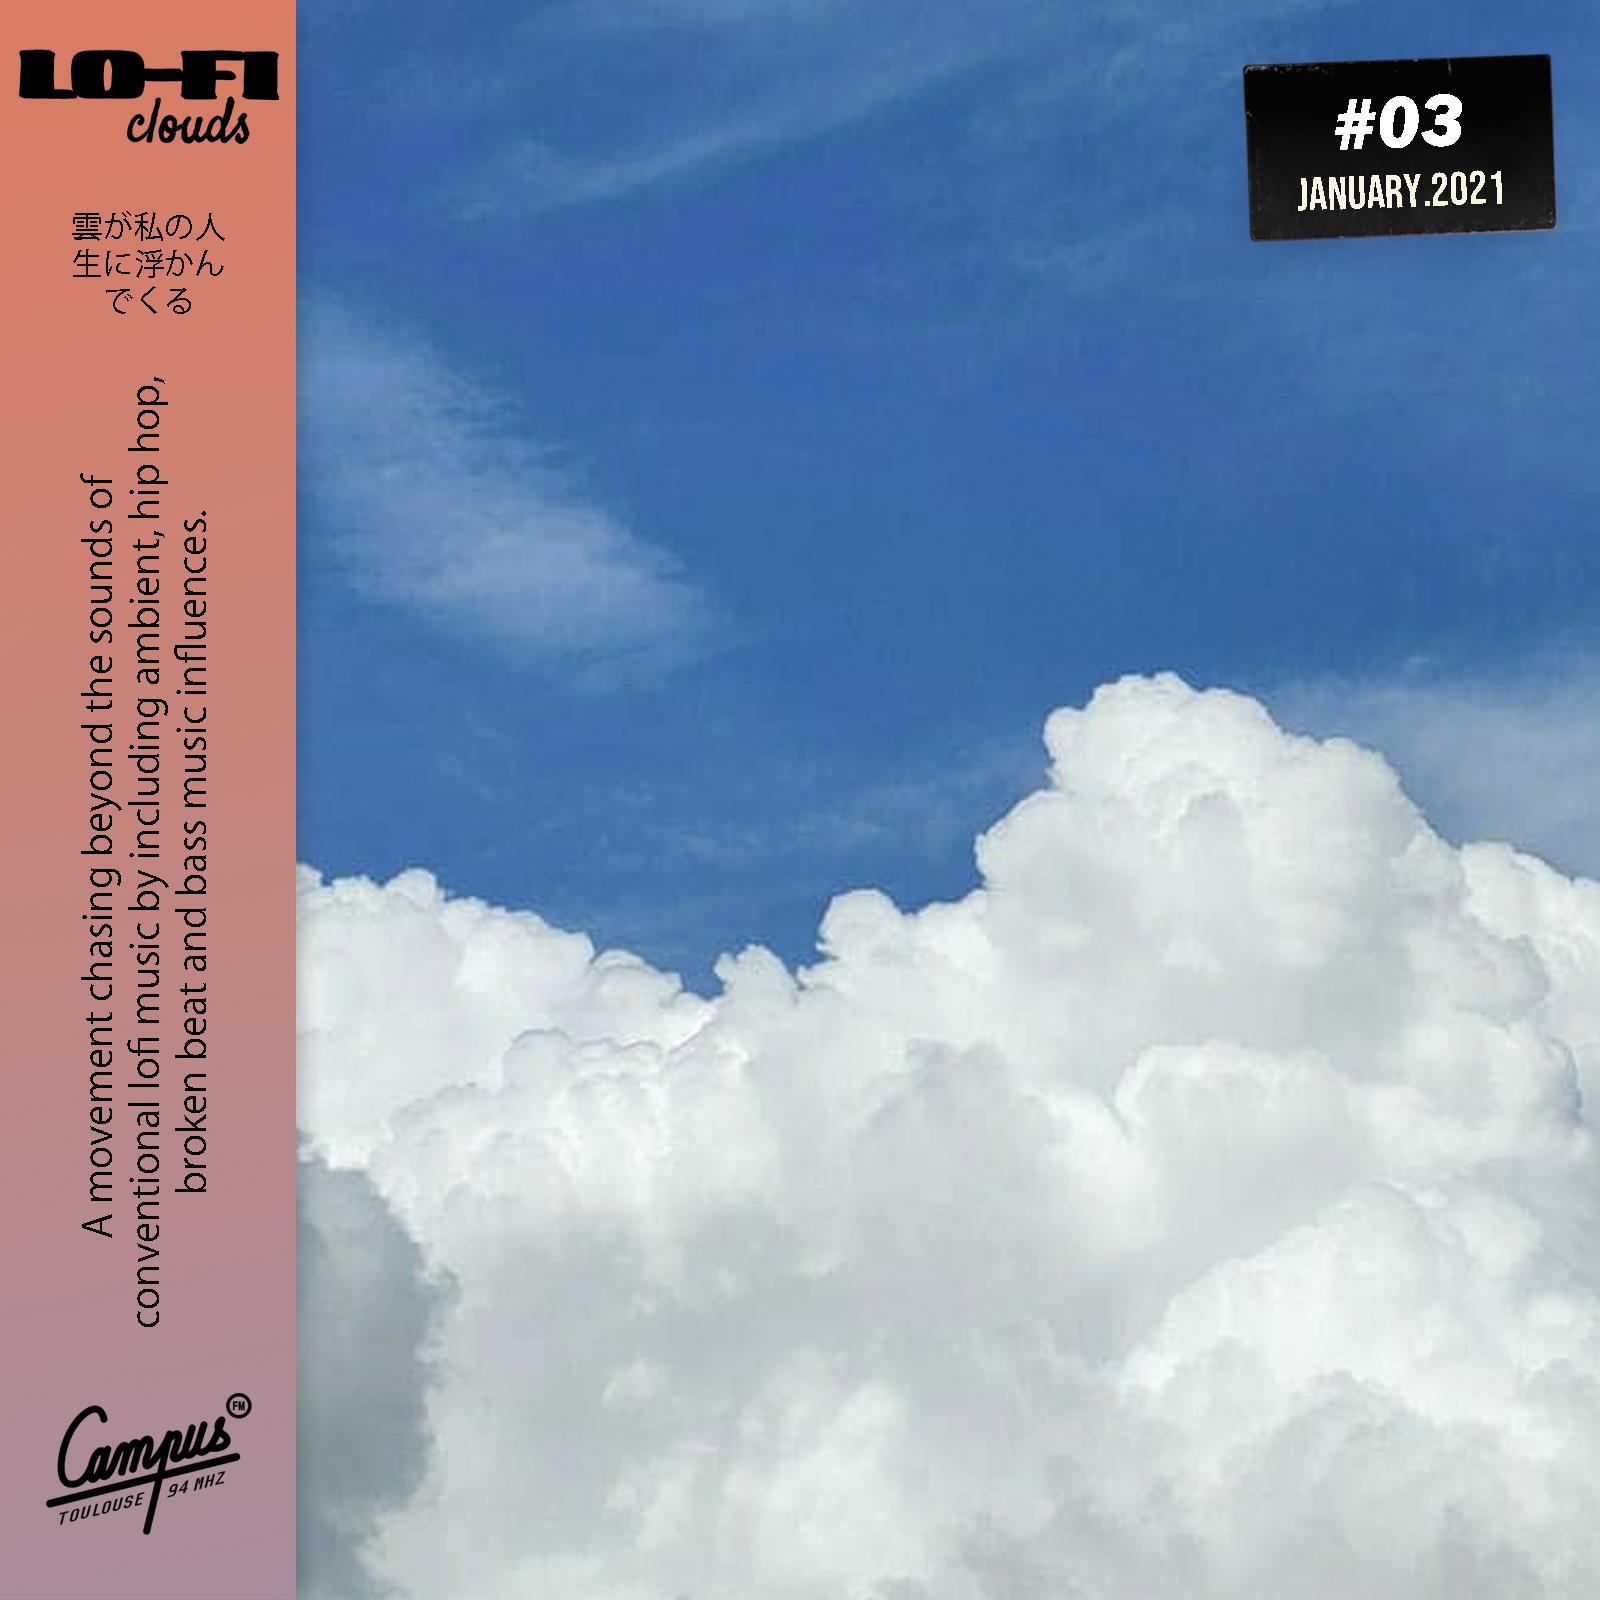 Lofi-clouds on CampusFM - January 2021 Studiomix cover